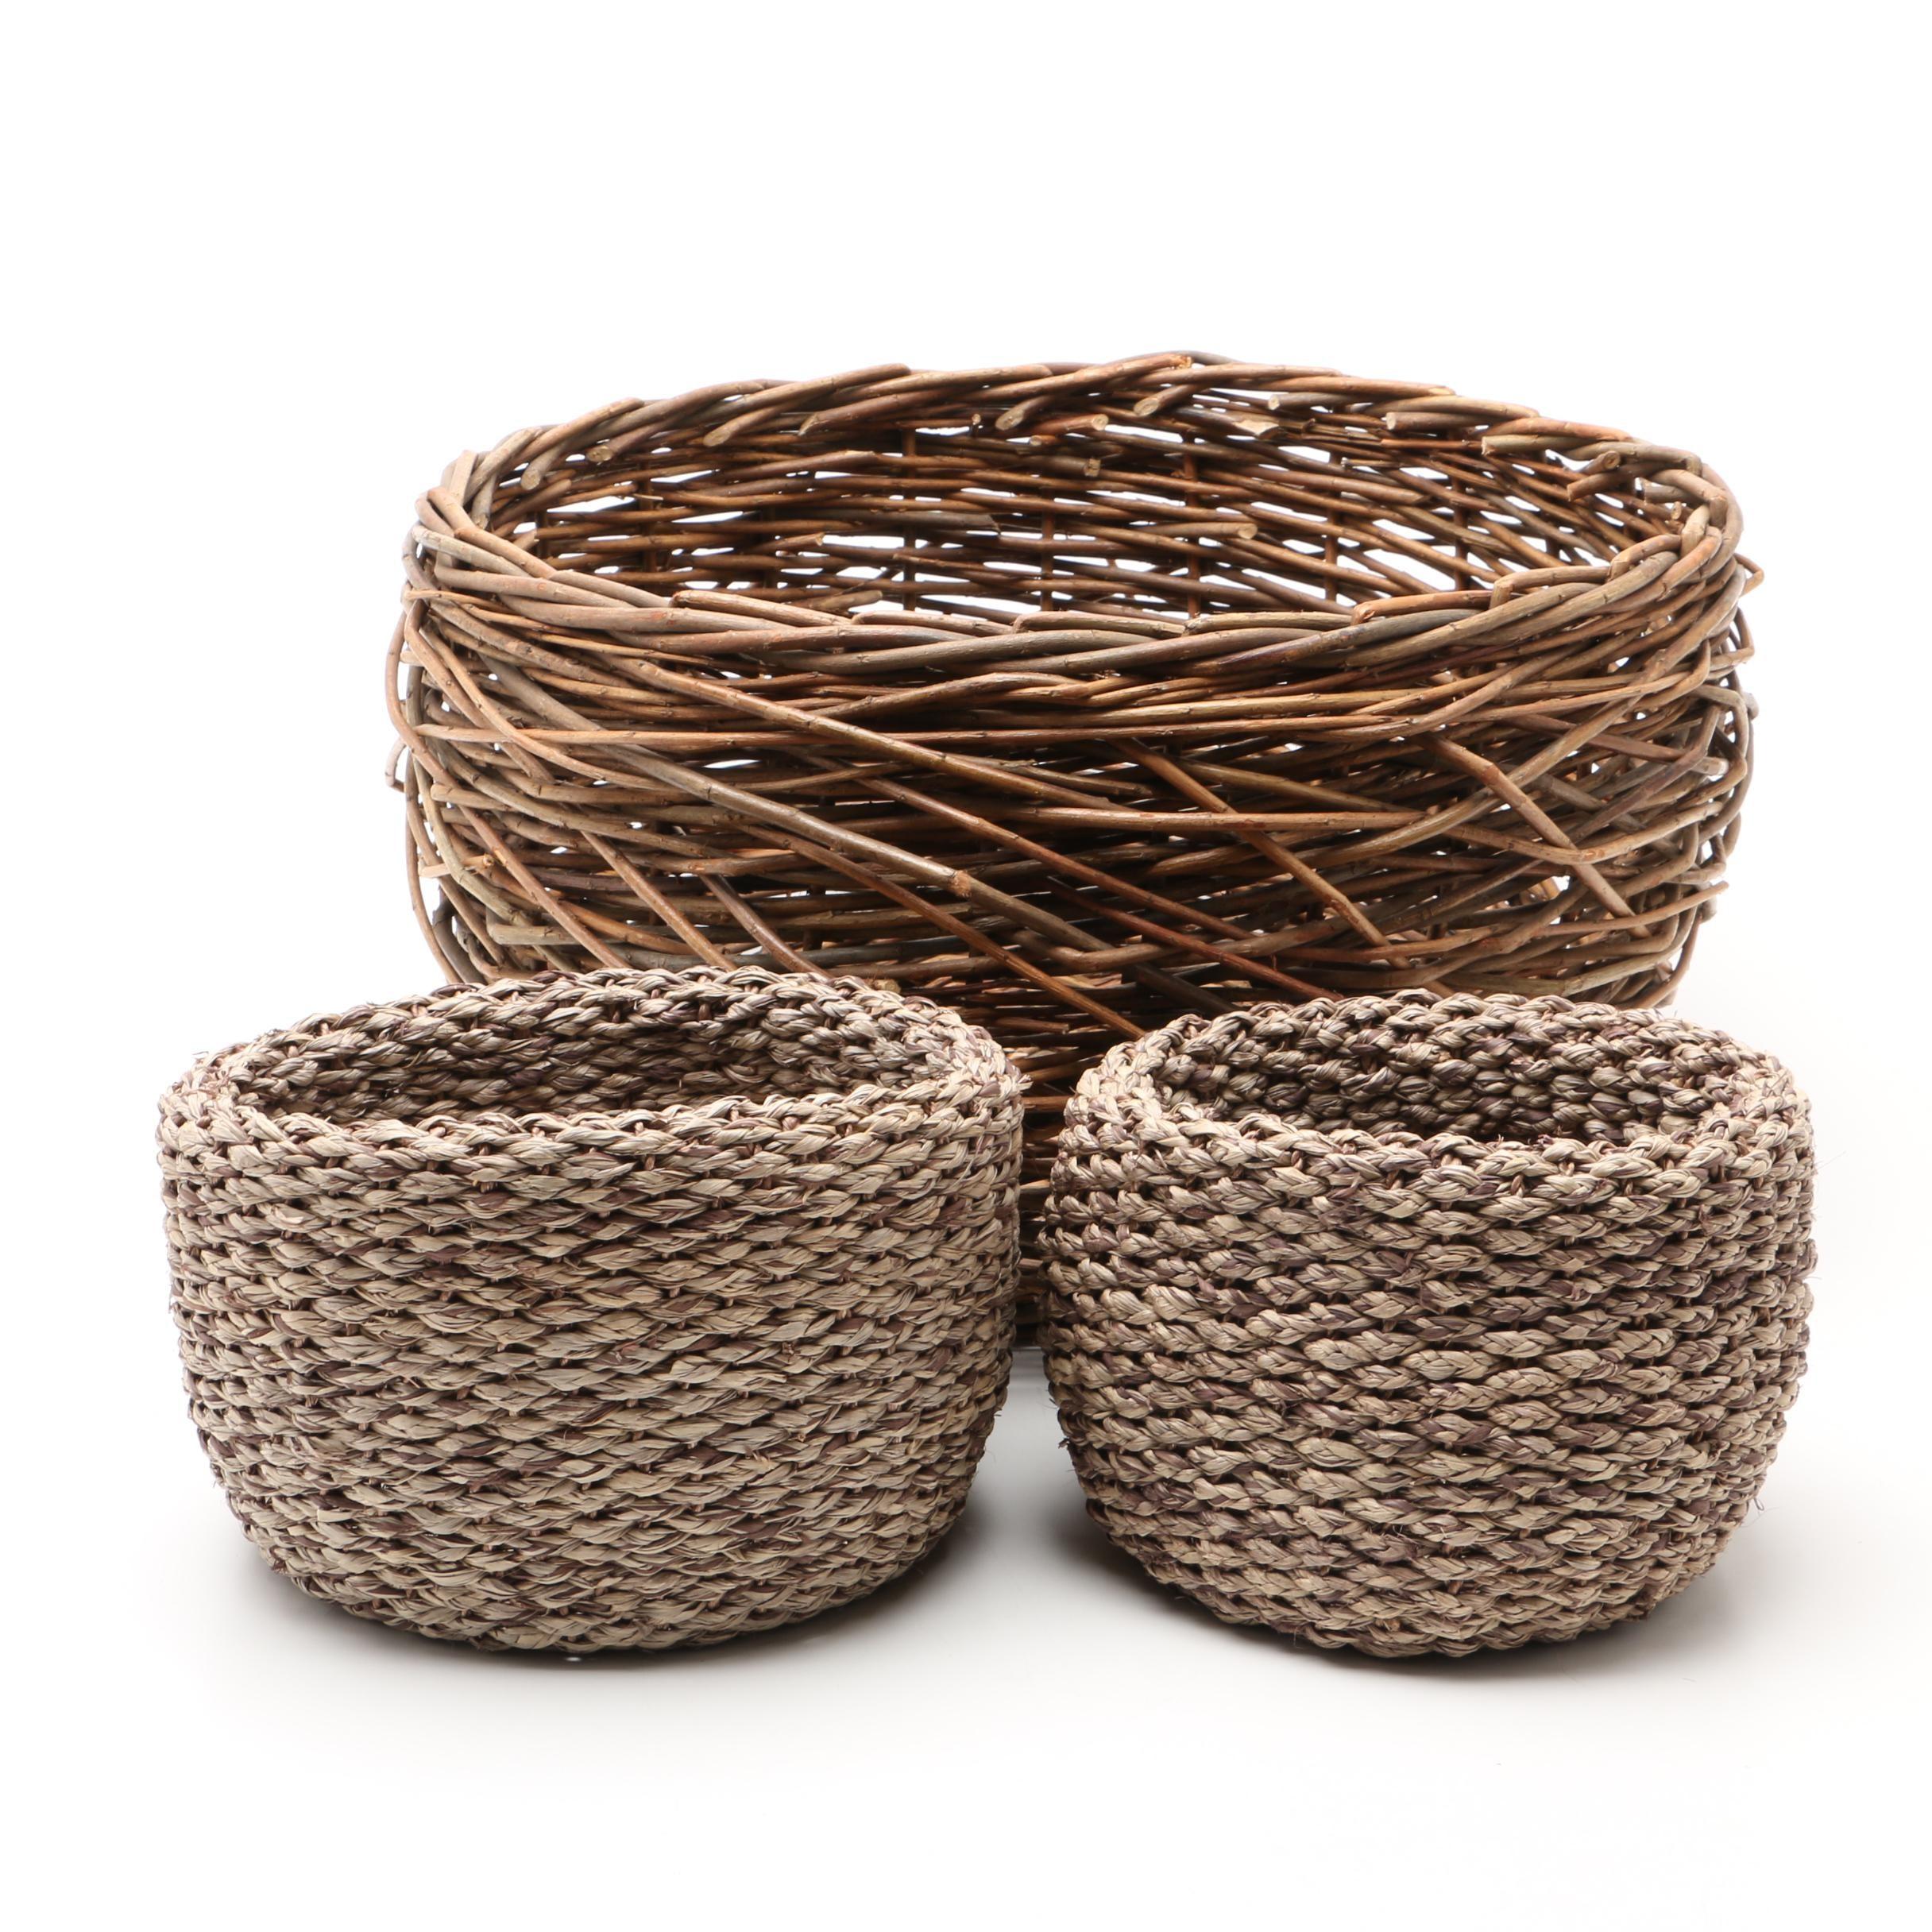 Three Decorative Baskets